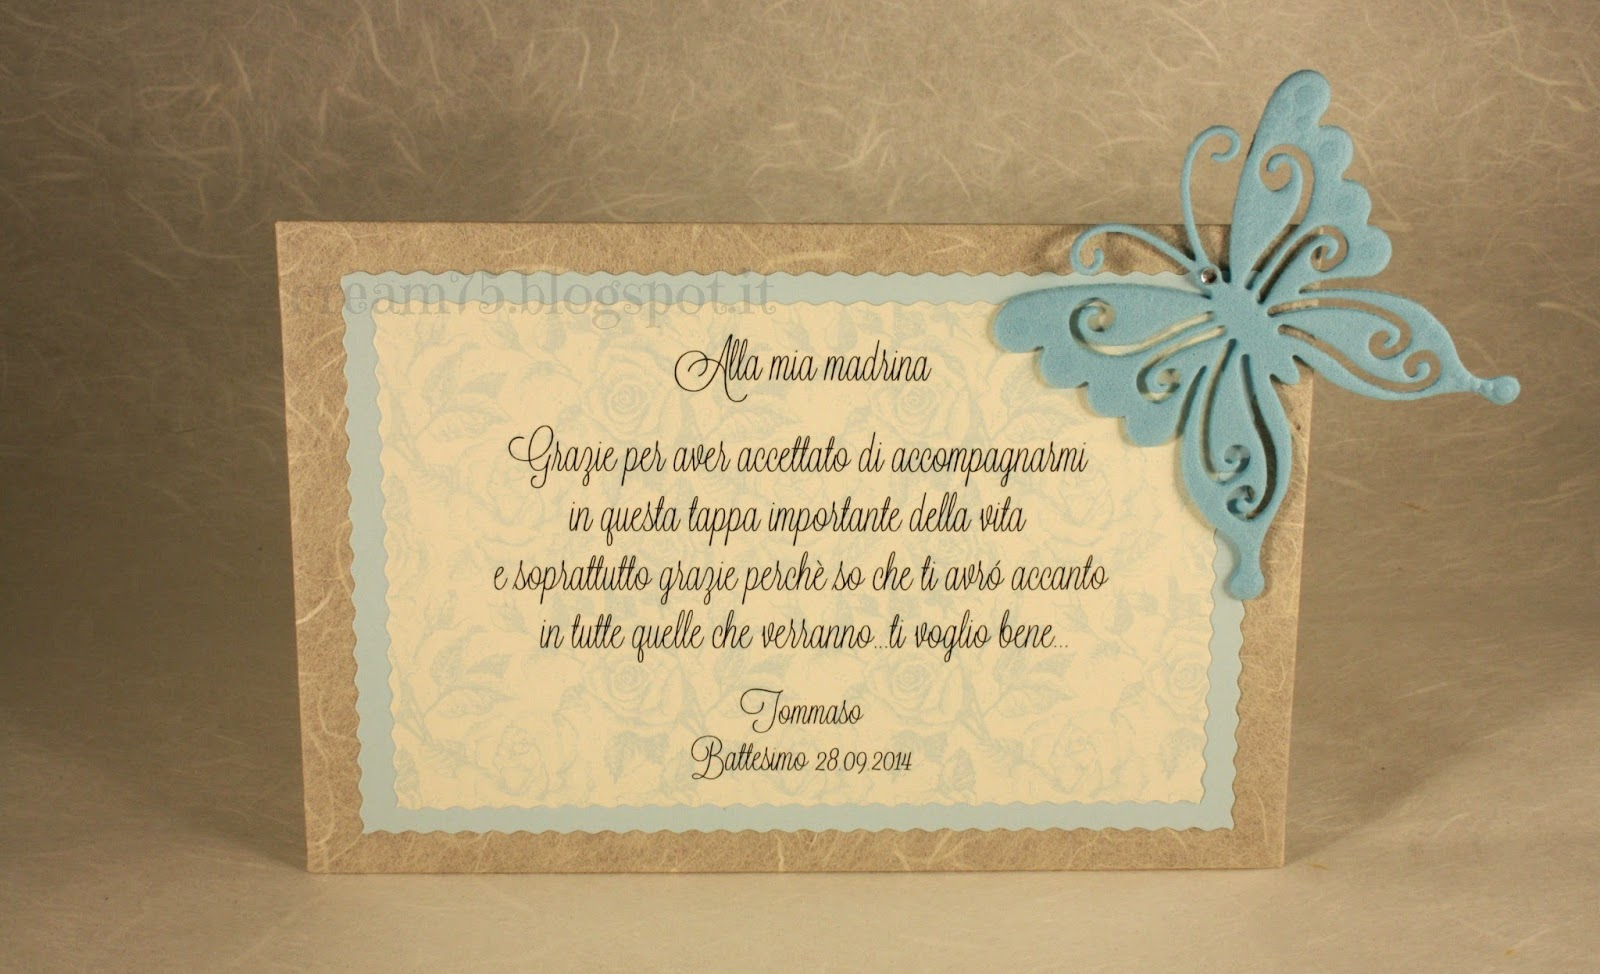 Frasi Auguri Matrimonio E Battesimo Insieme : Frase invito battesimo lo pineglen